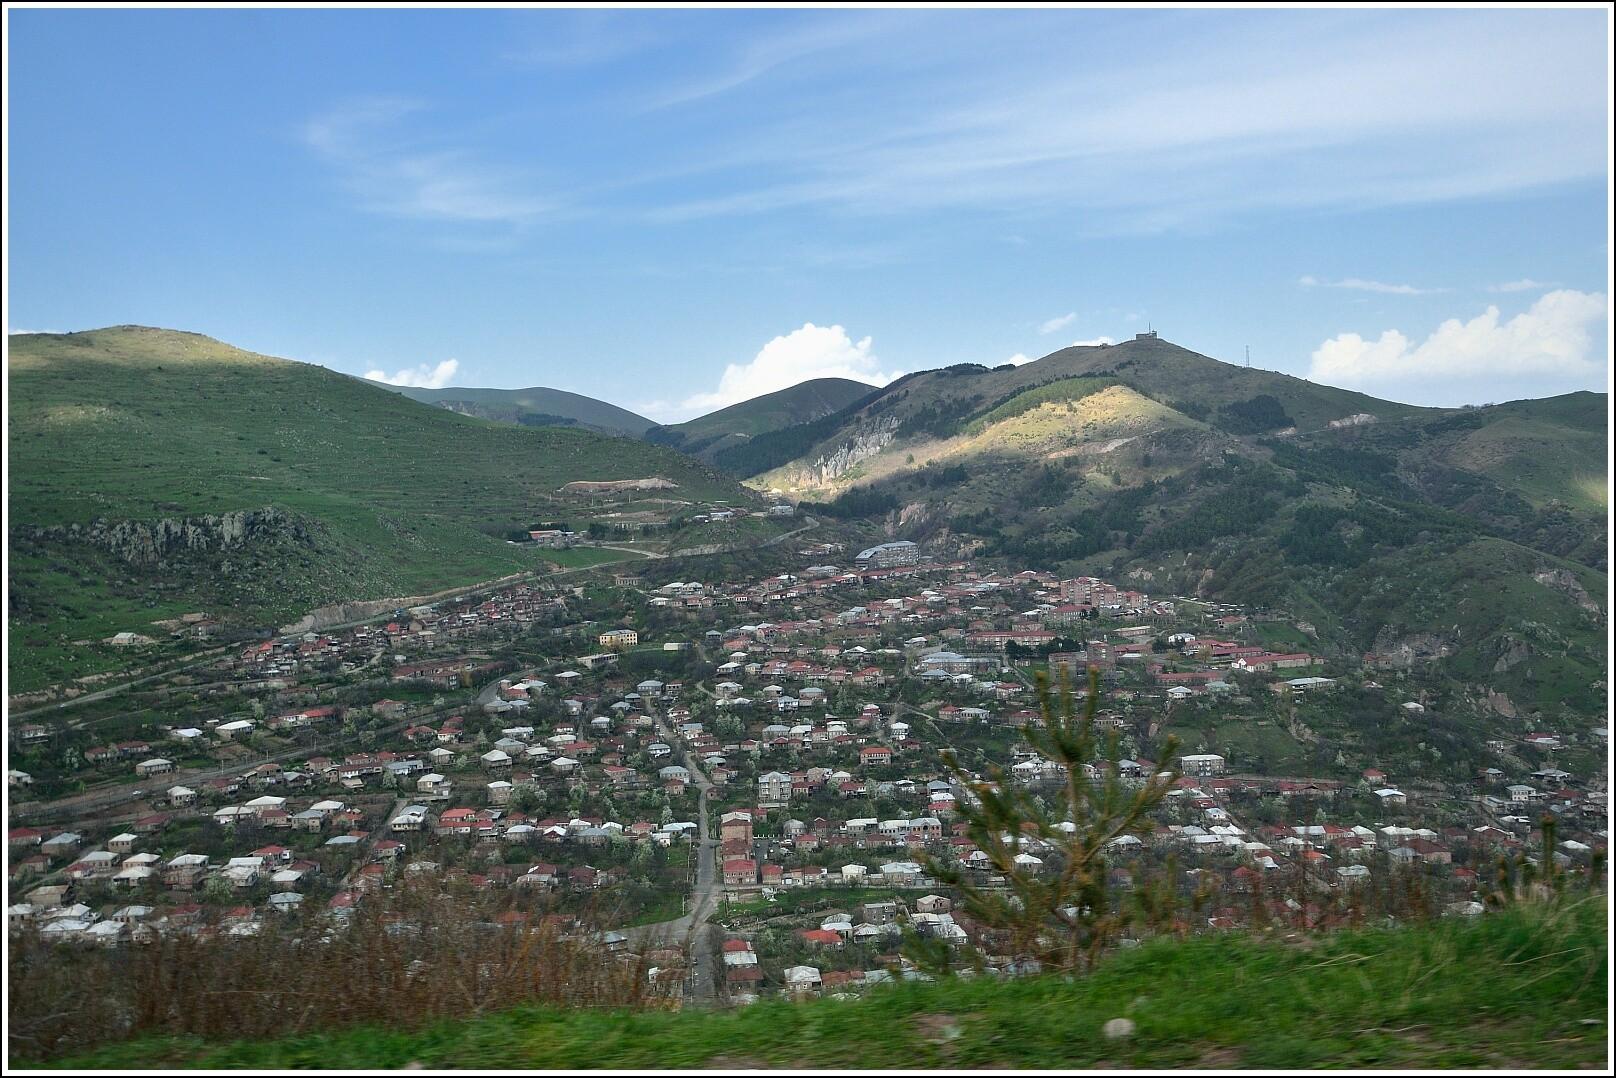 часть село ташир армения фото опасное